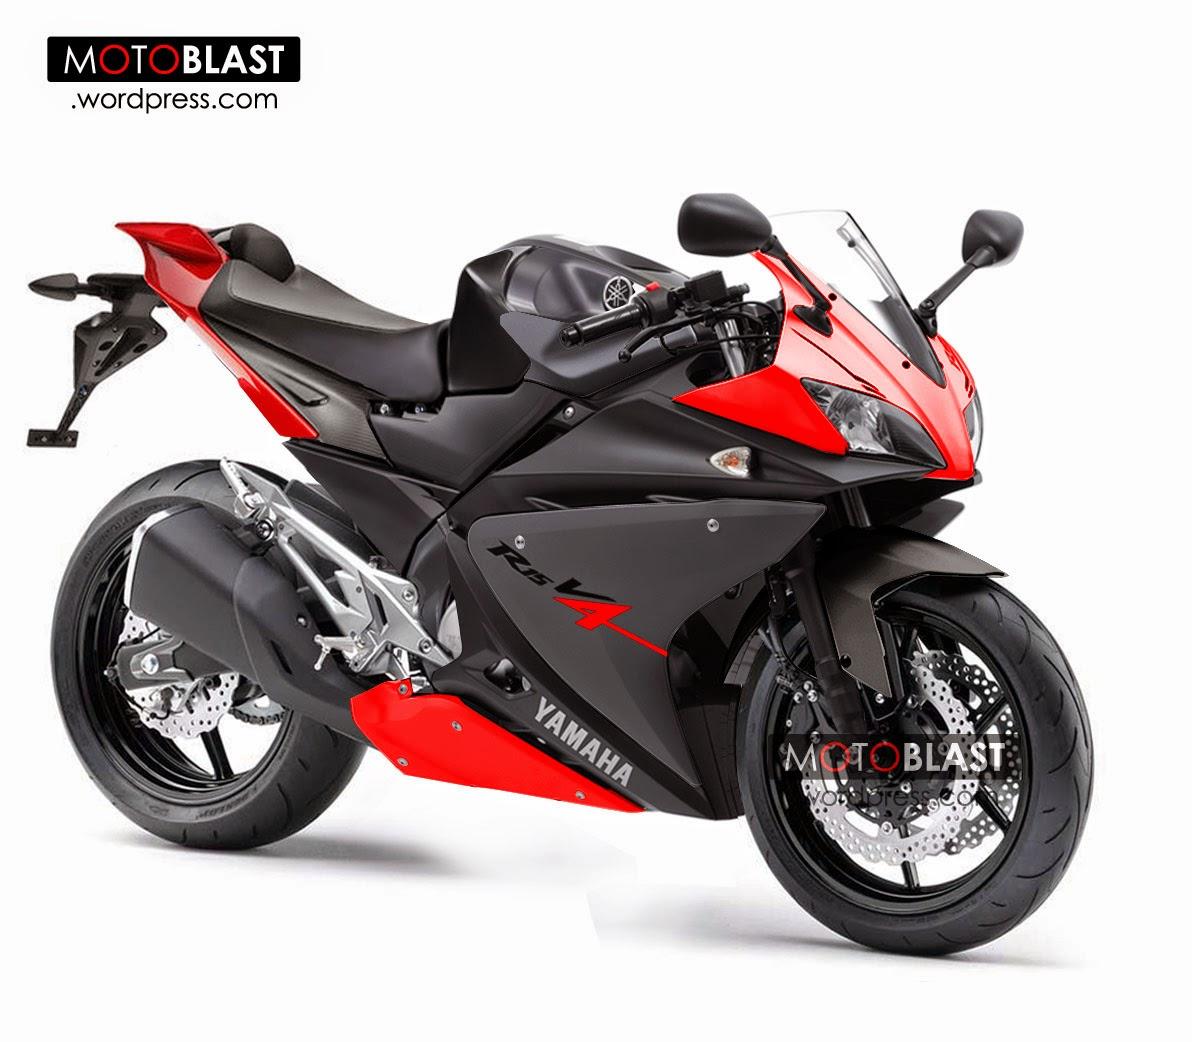 Modifikasi Mesin Yamaha New Vixion